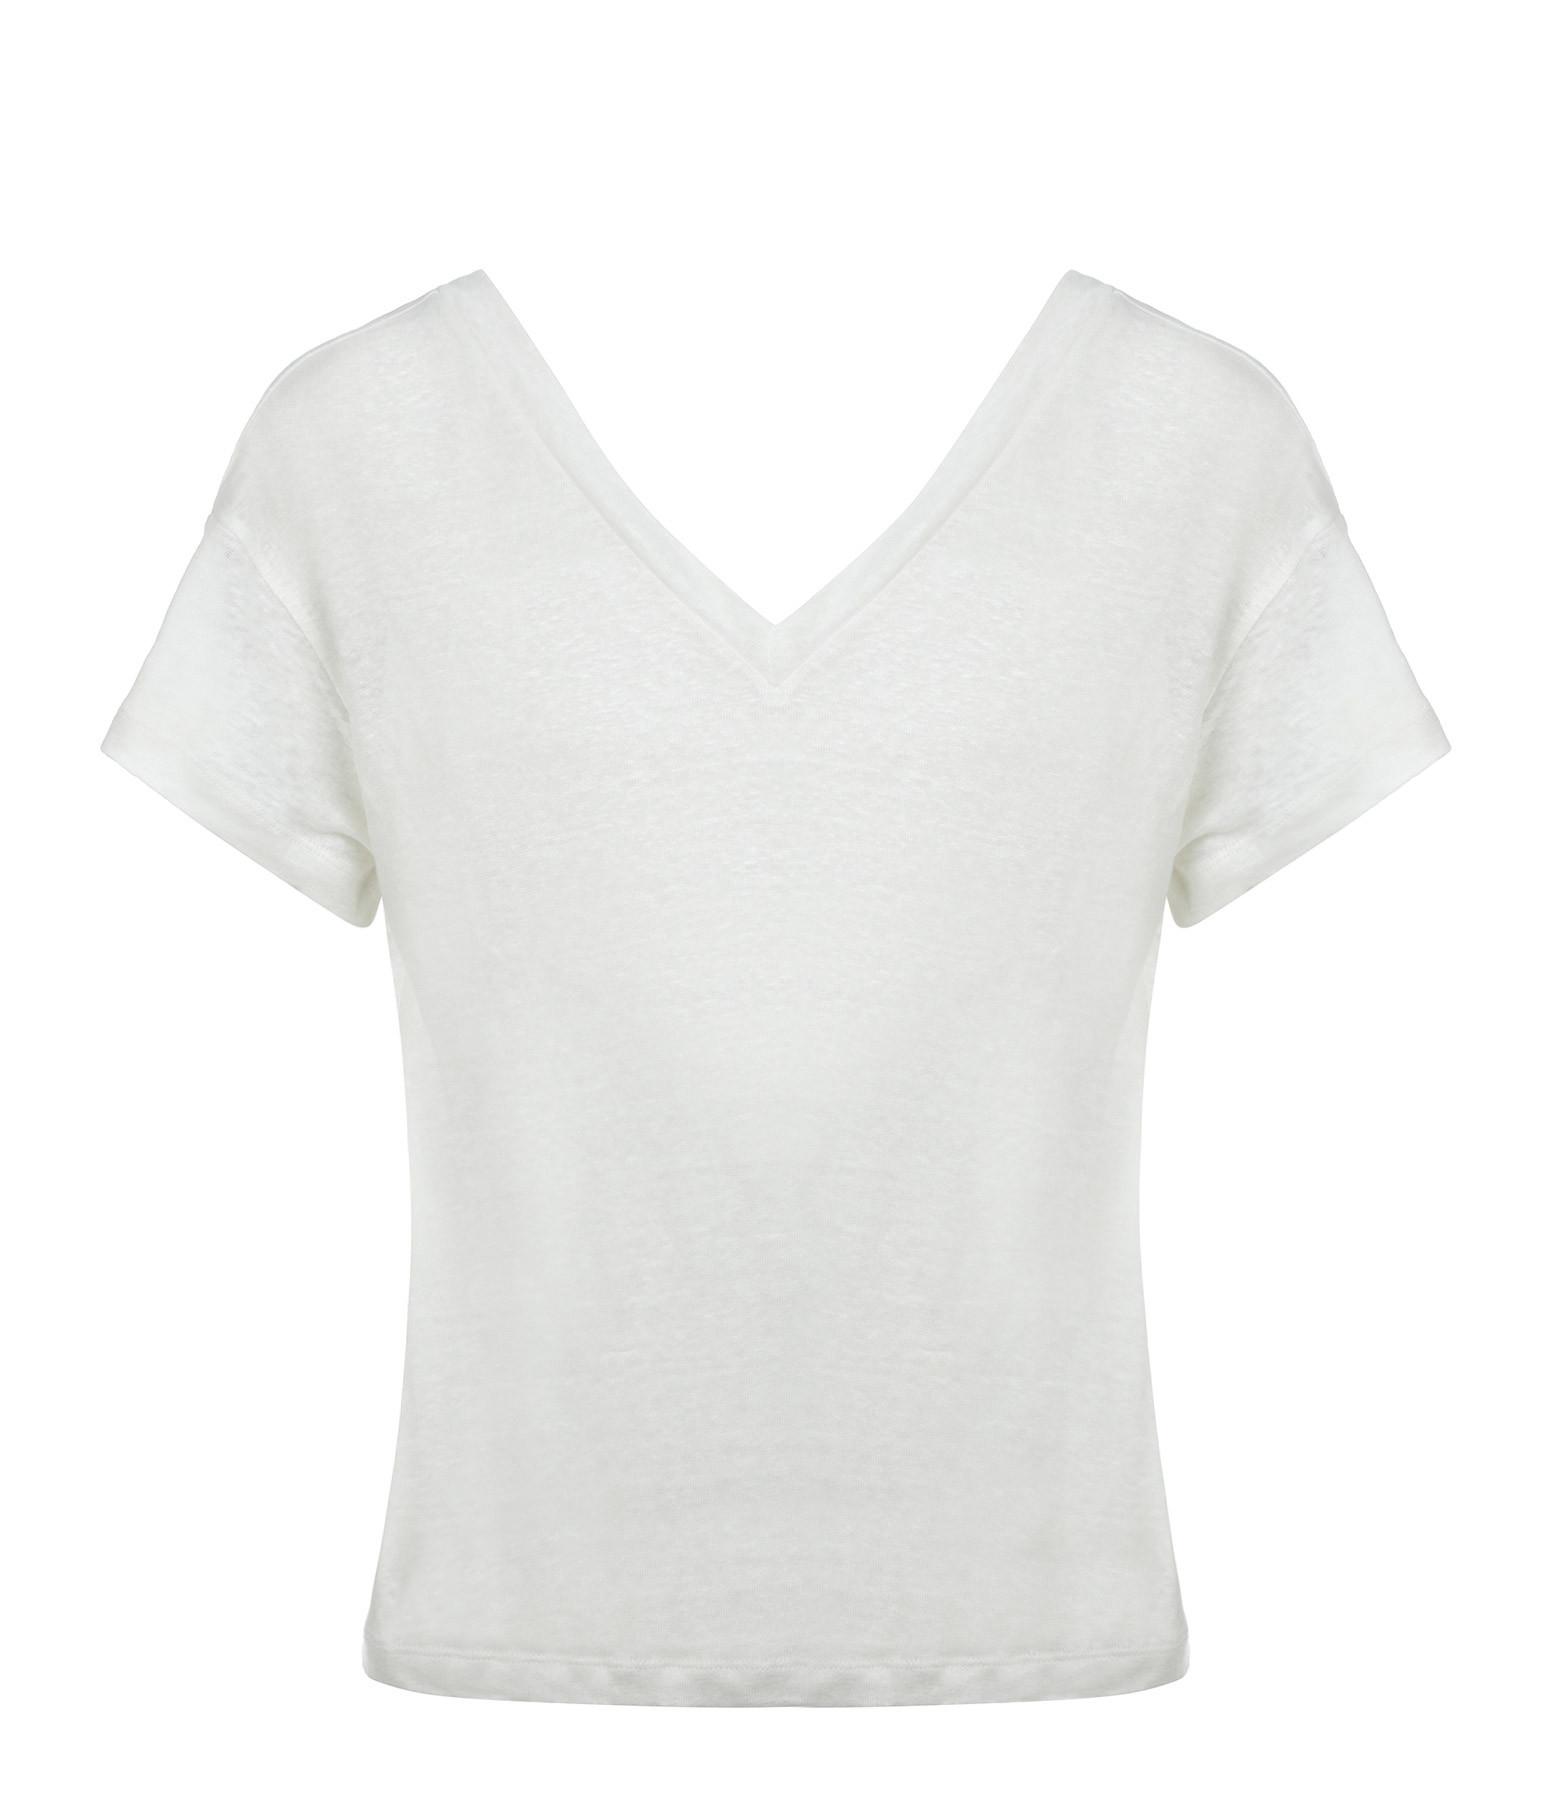 MAJESTIC FILATURES - Tee-shirt  Dos Décolleté Lin Écru